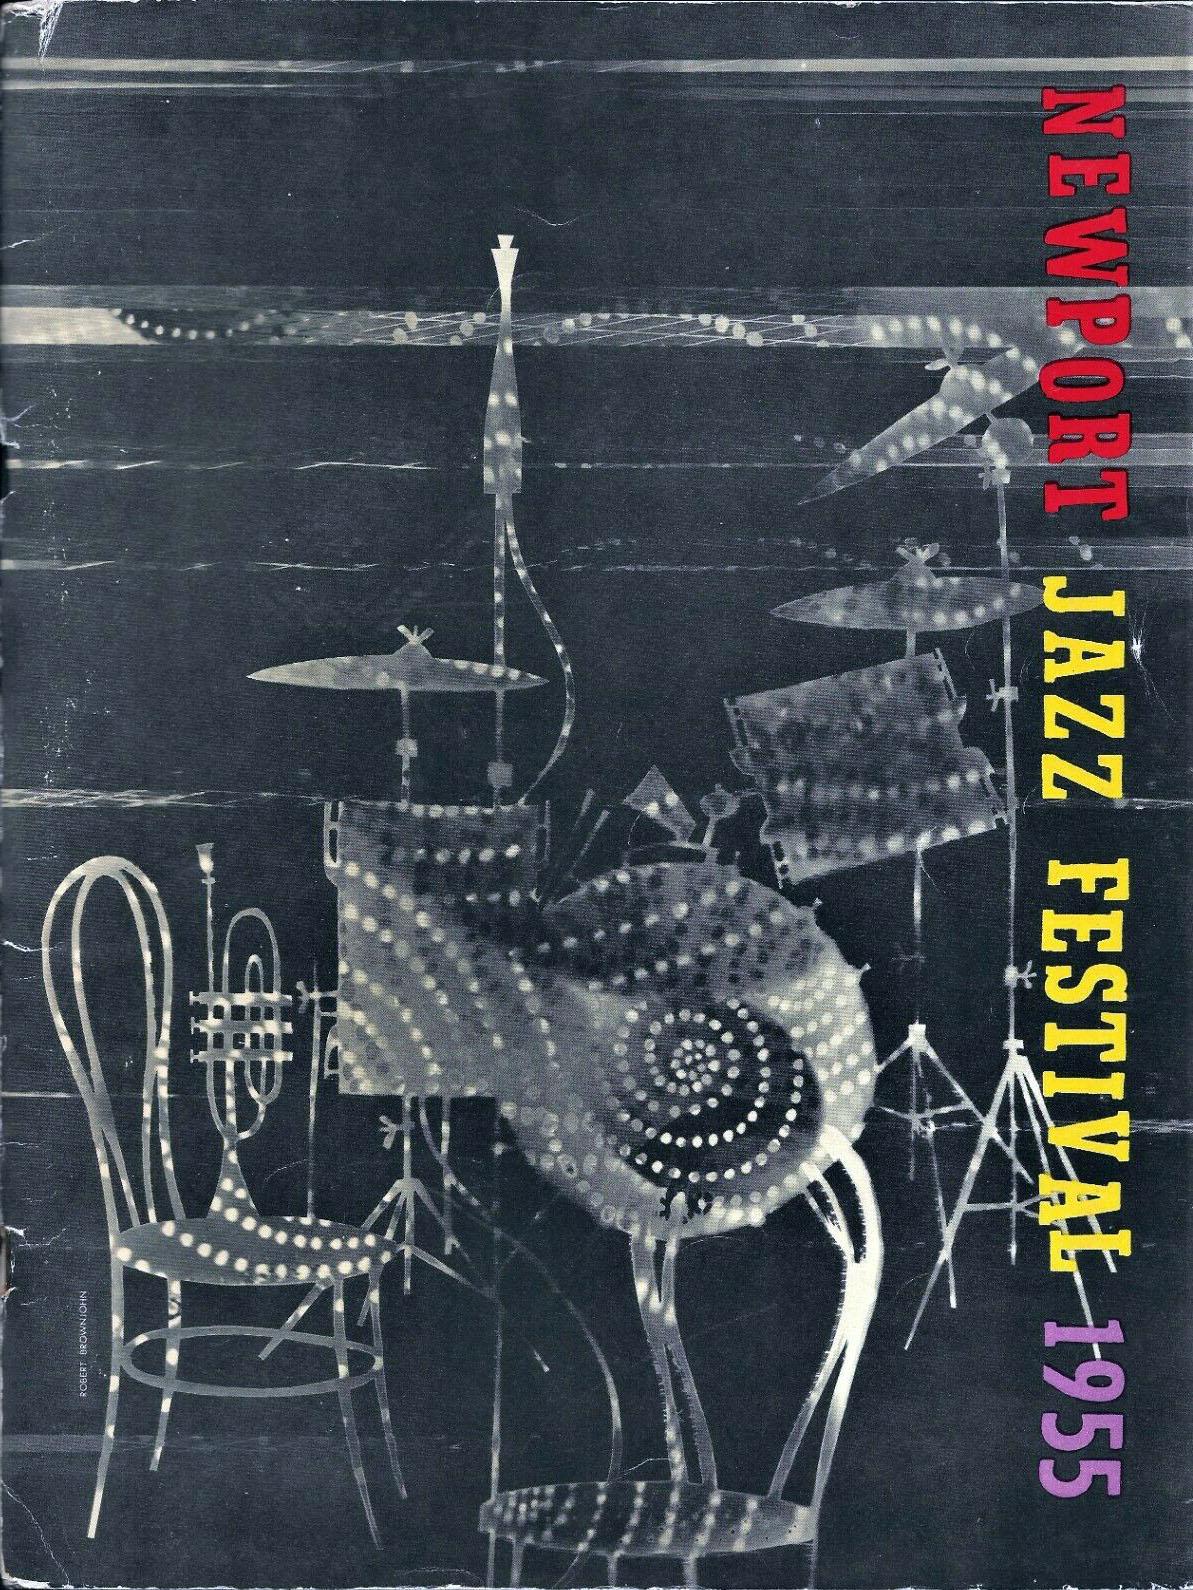 Newport Jazz Festival 1955 Program